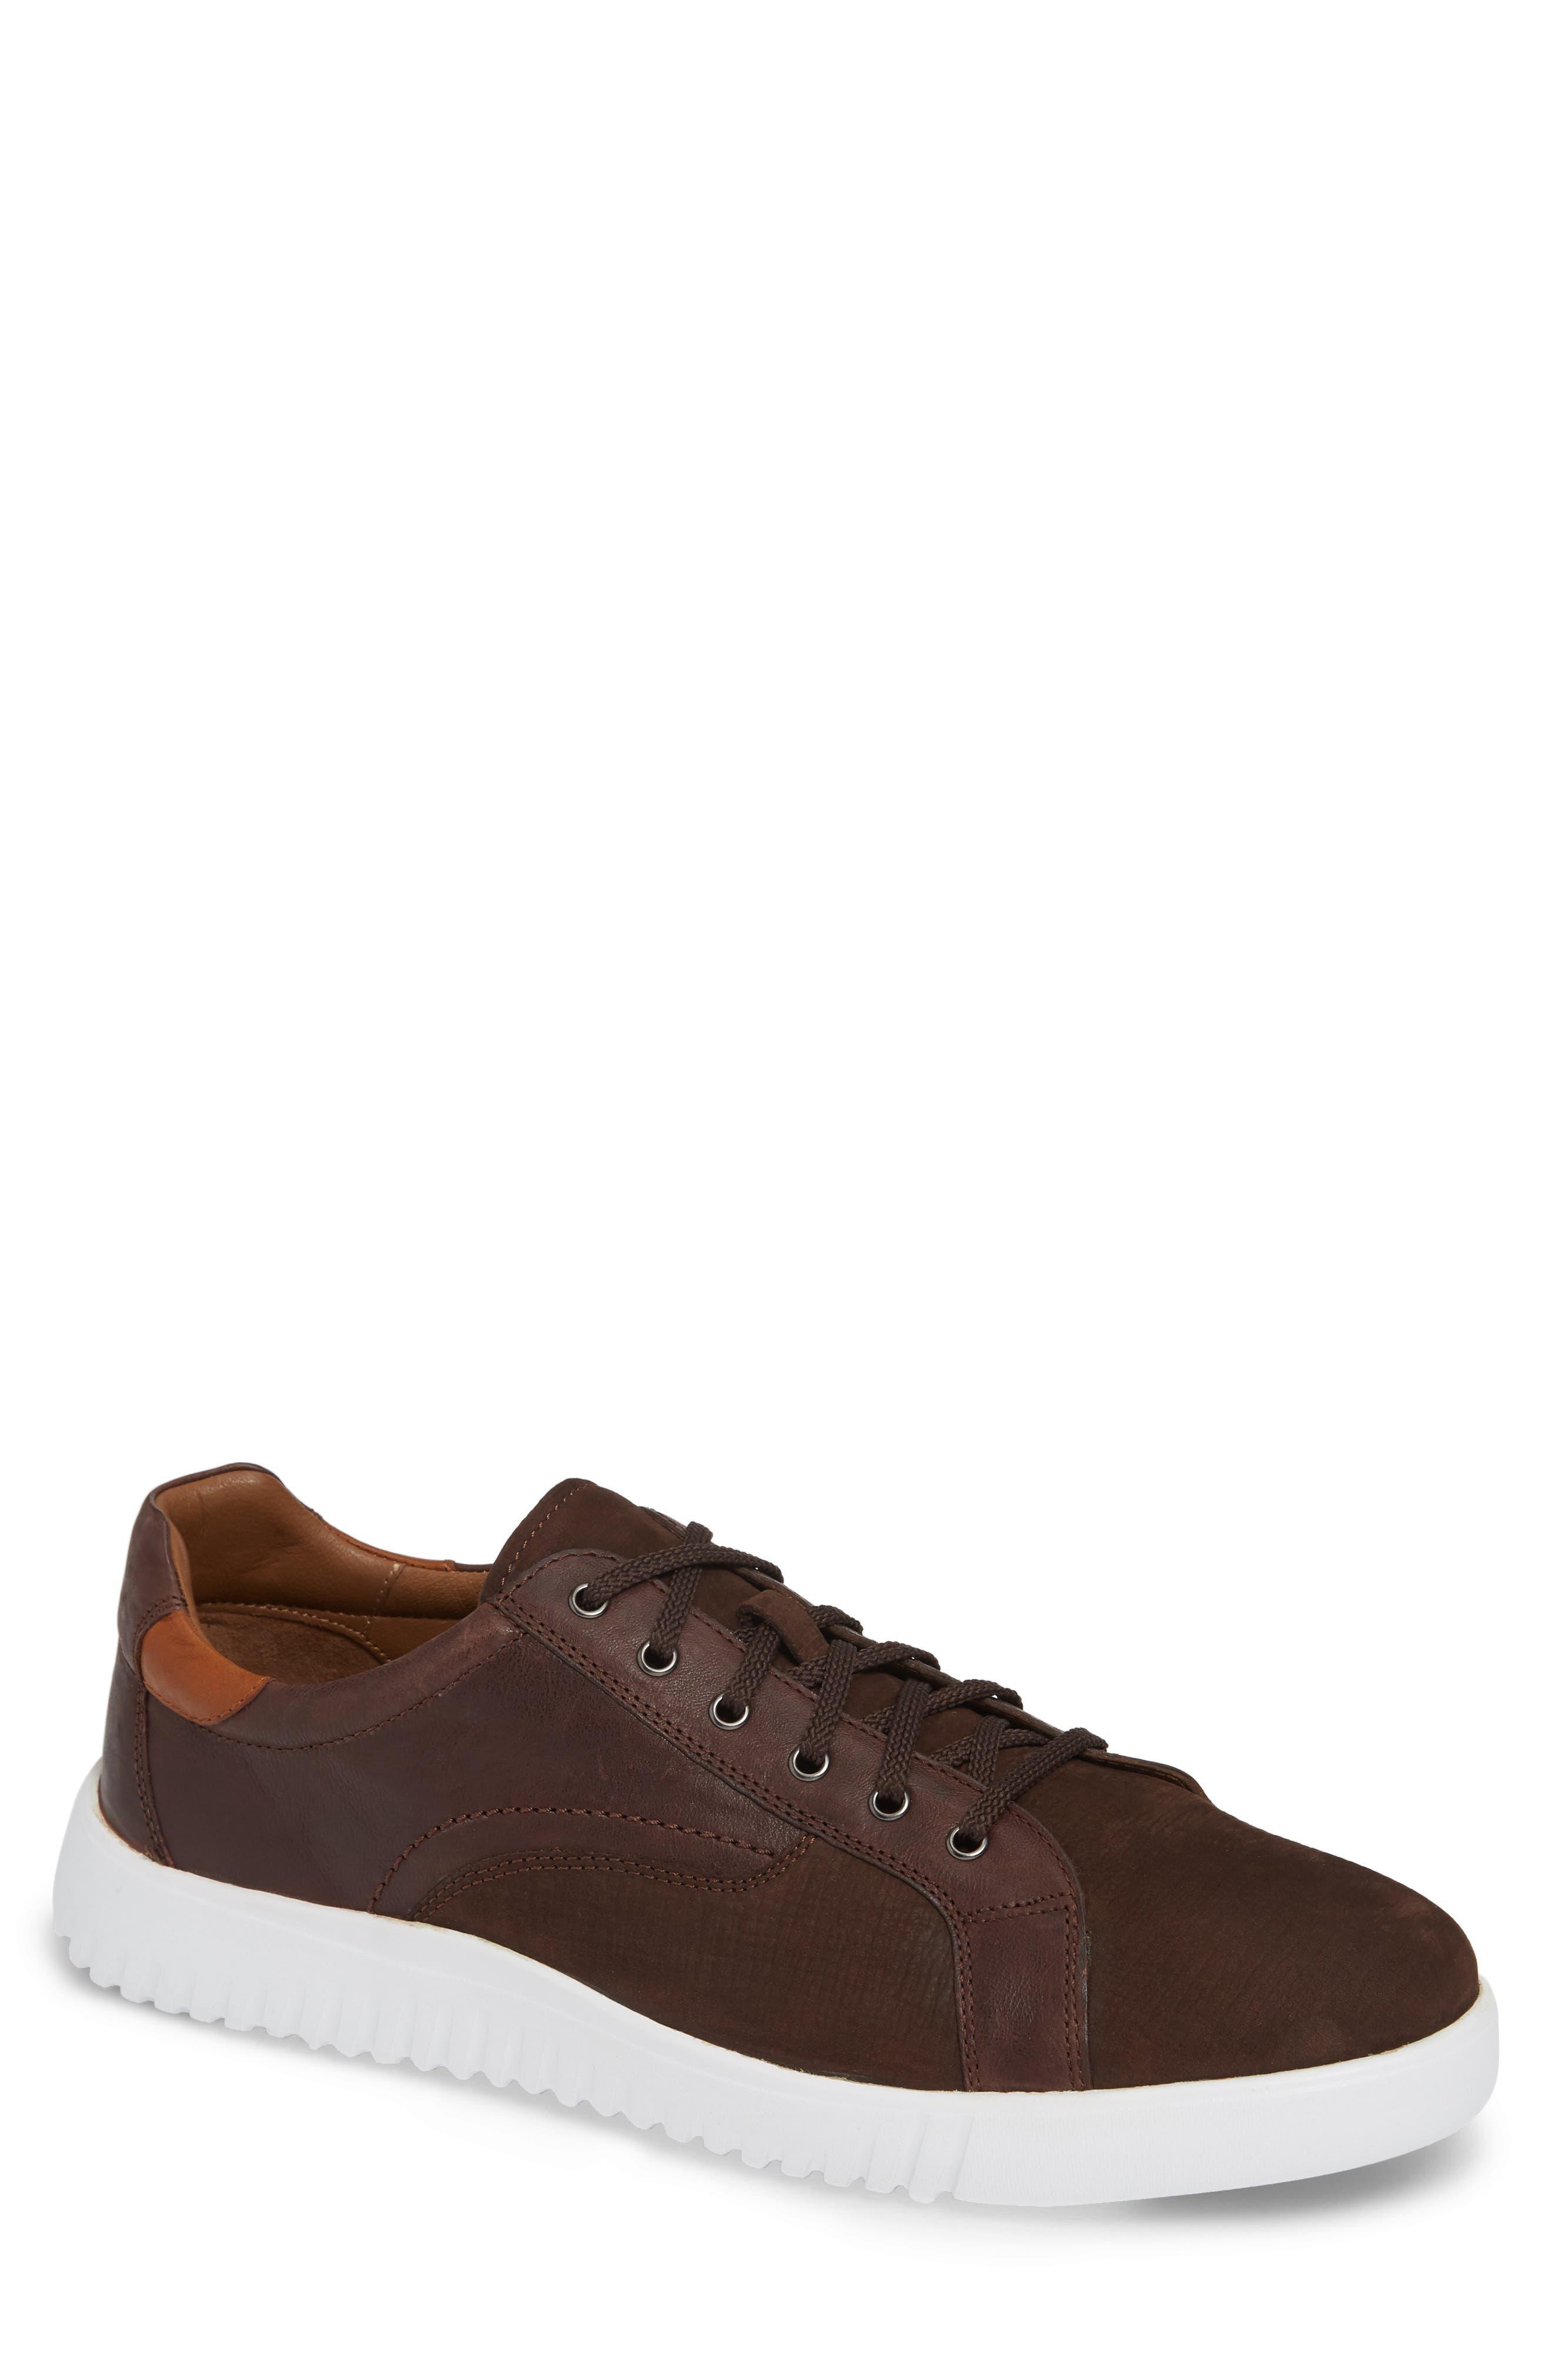 Johnston & Murphy Mcfarland Sneaker, Brown